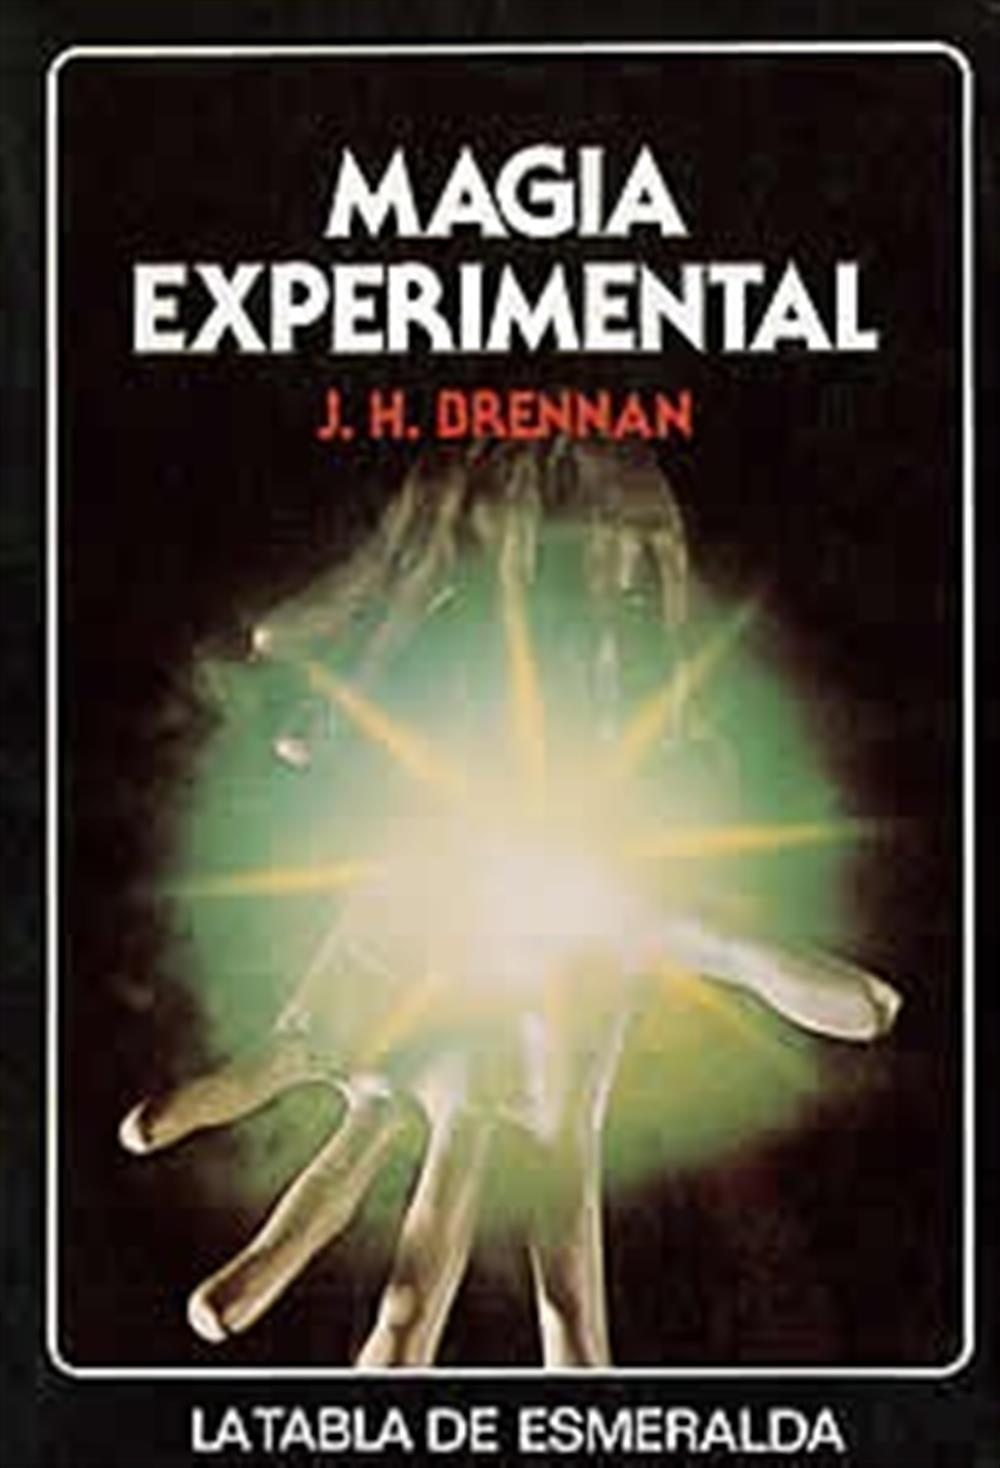 Magia experimental